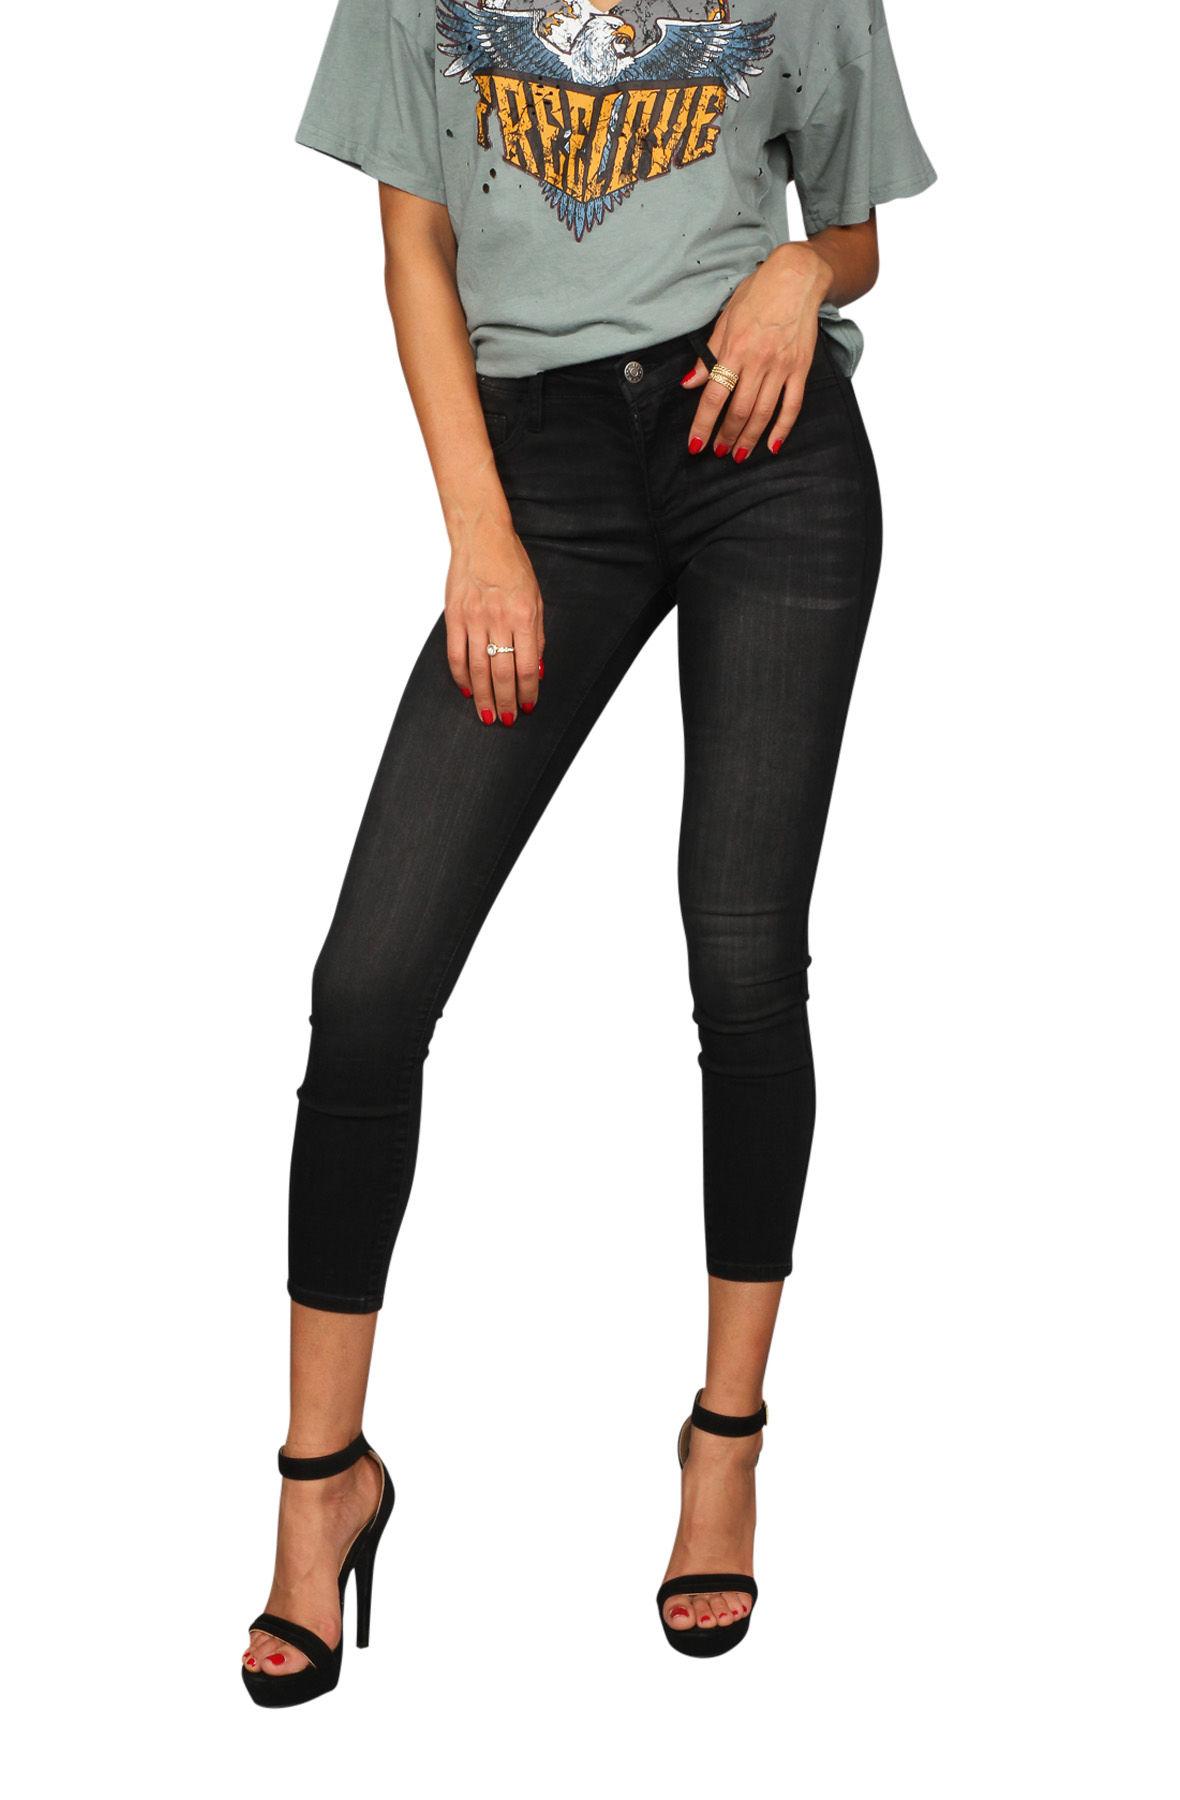 Image of The Skinny Jeans in Black